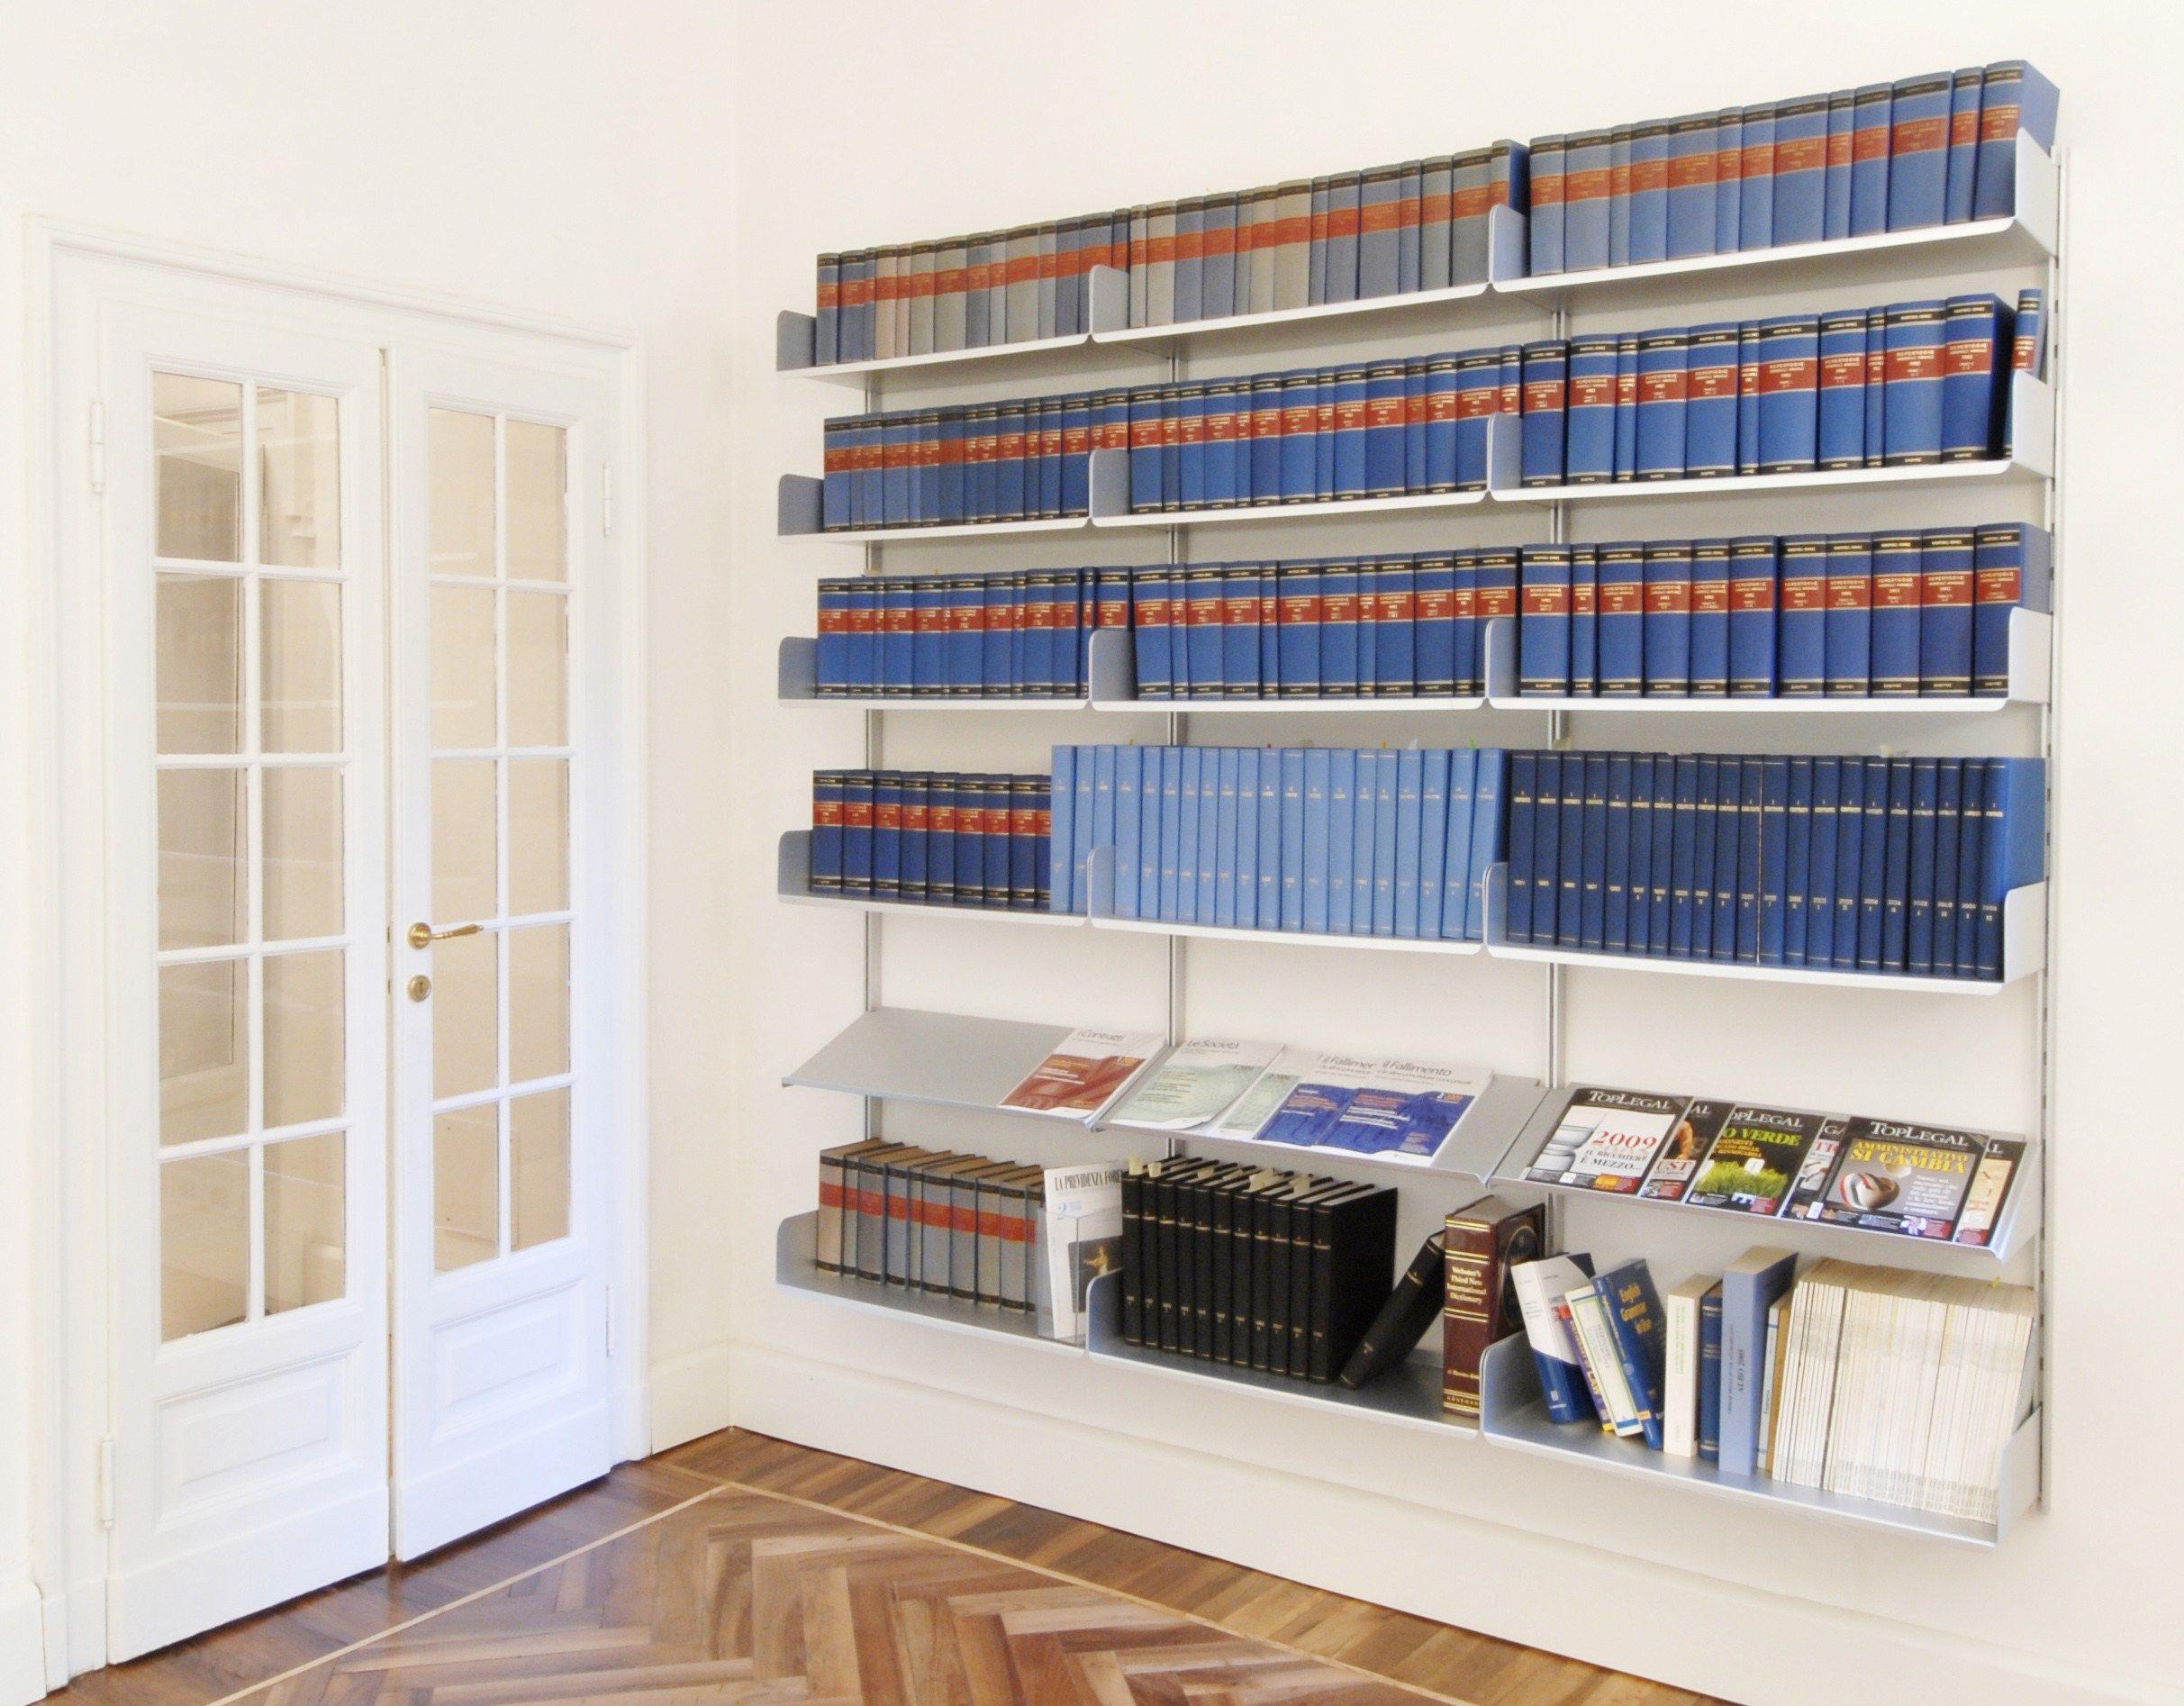 k1 office shelving by kriptonite